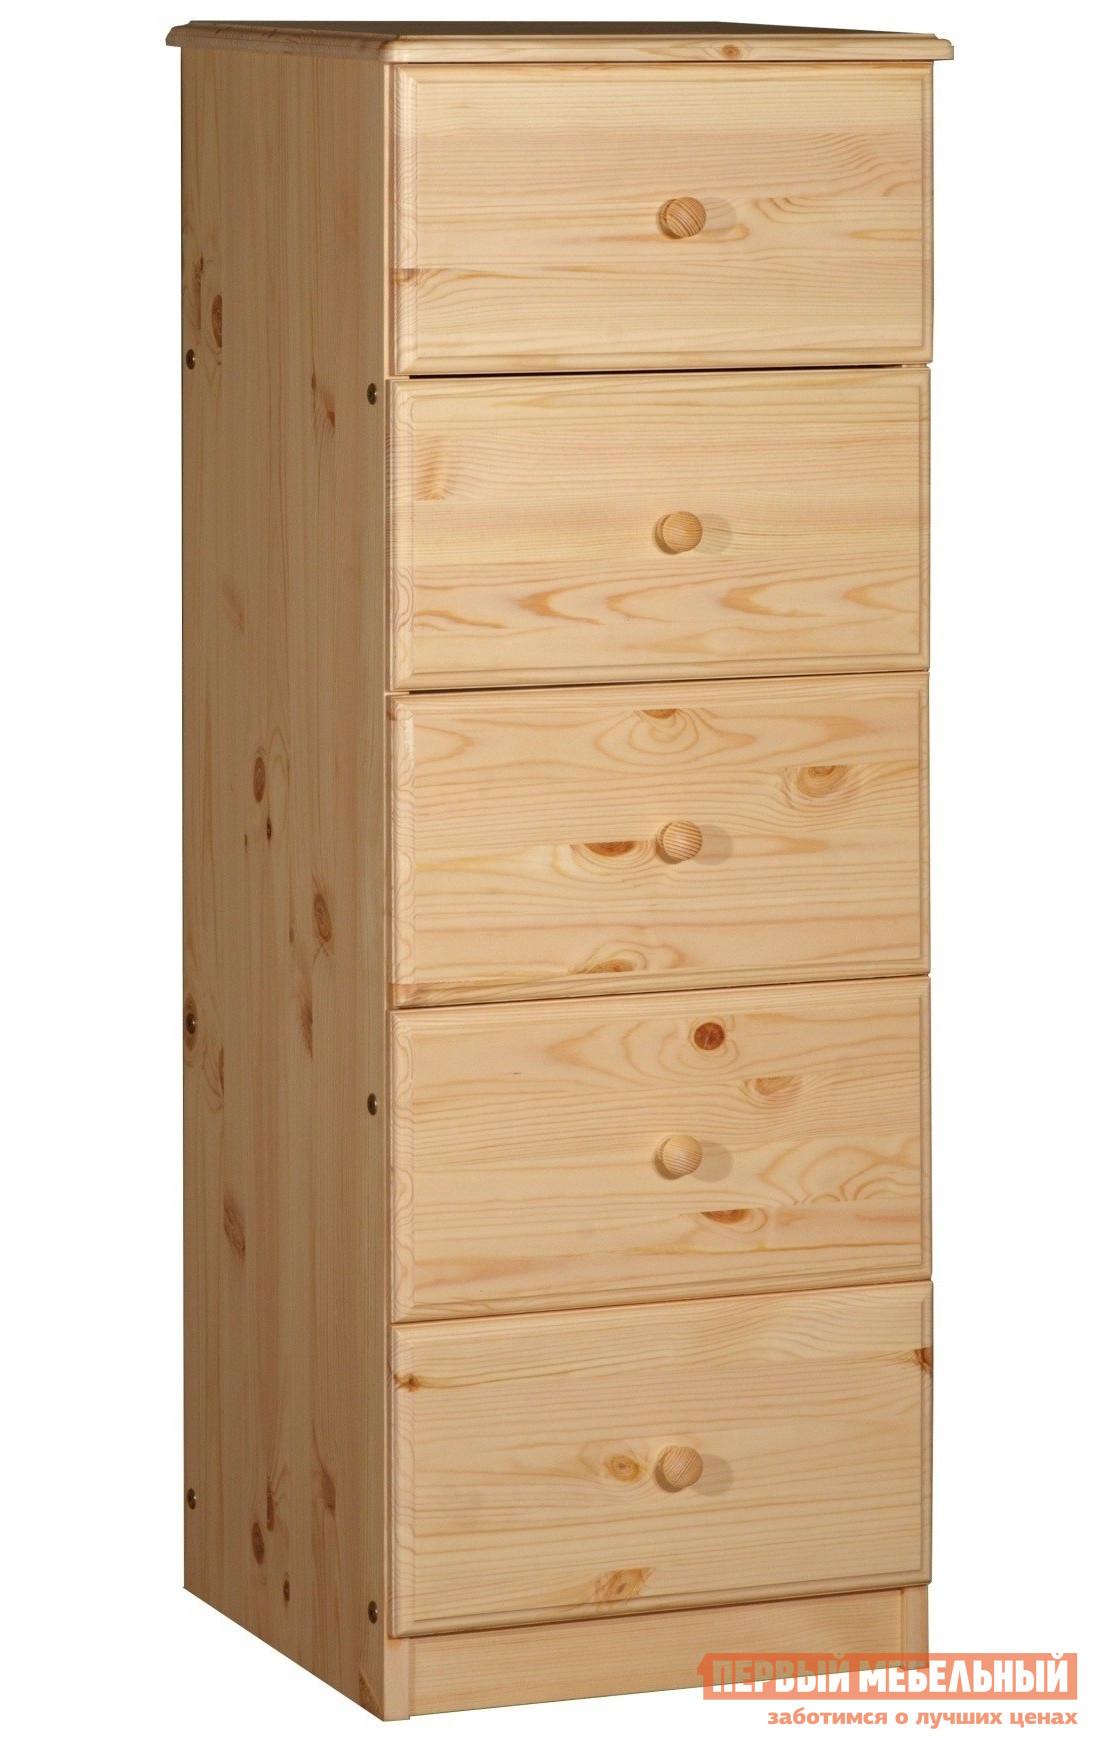 Комод Timberica Комод Классик №4 комплект детской мебели timberica классик эмаль белая к1